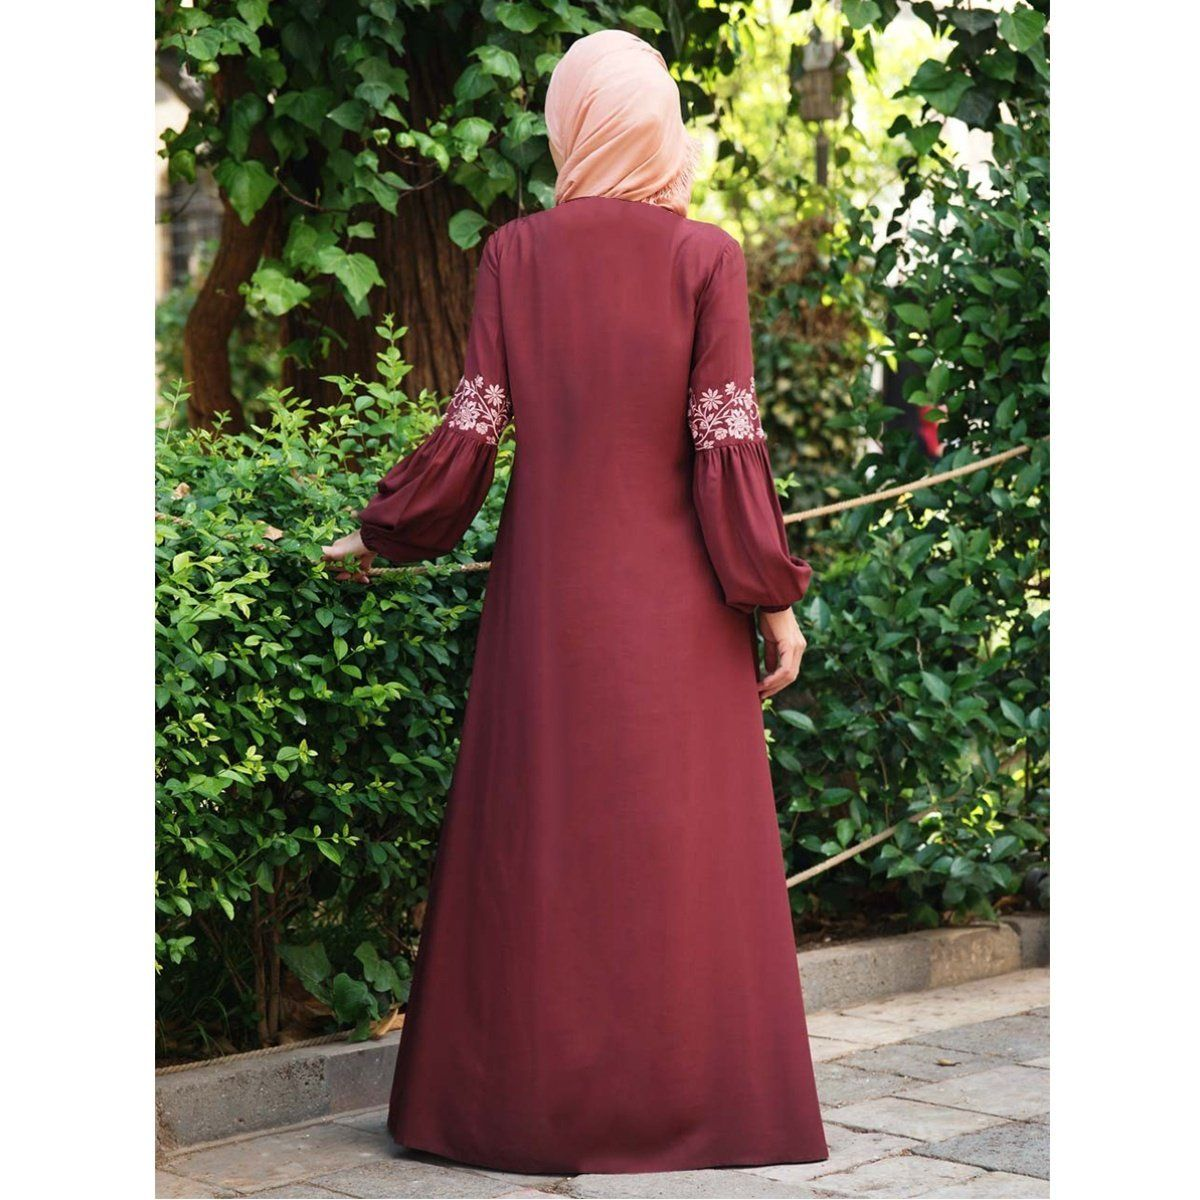 Sysea Women Muslim Dress Lace Stitching Long Sleeve Maxi Dress Walmart Com Walmart Com In 2021 Abayas Fashion Long Sleeve Maxi Dress Fashion [ 1200 x 1200 Pixel ]